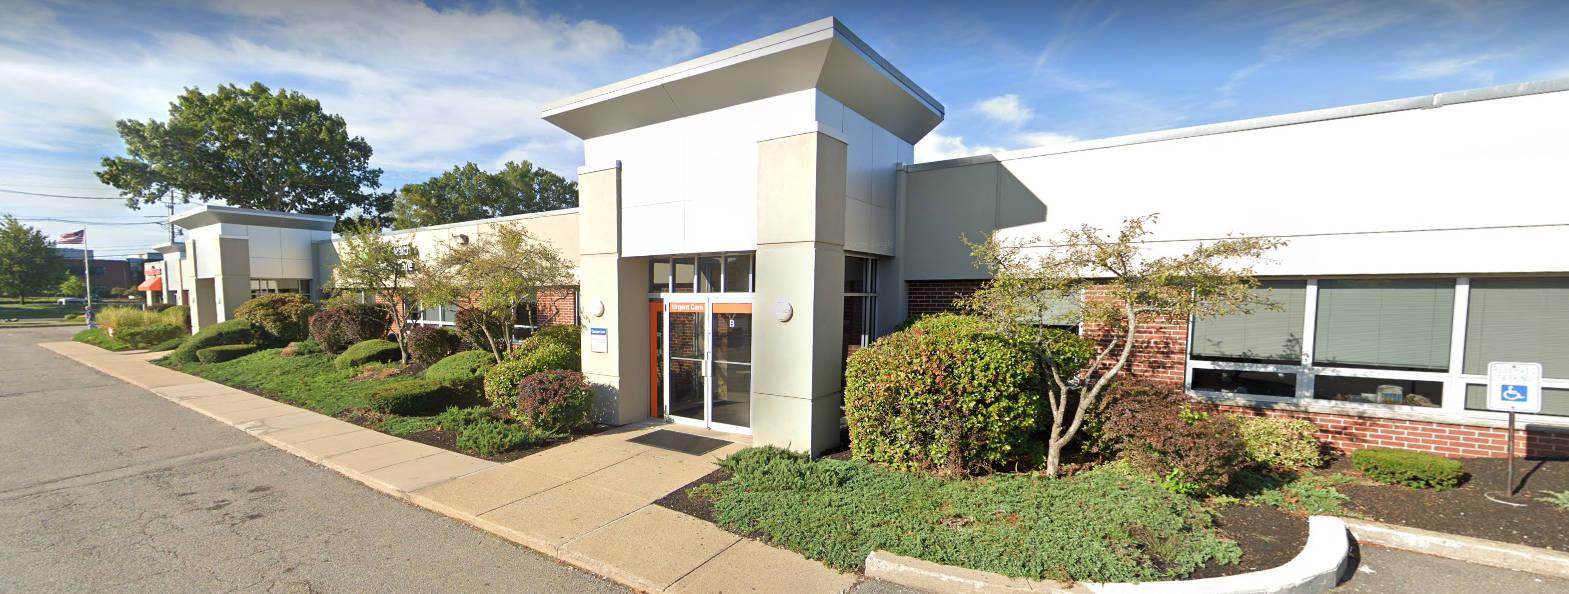 Banyan Treatment Center, Wilmington, MA